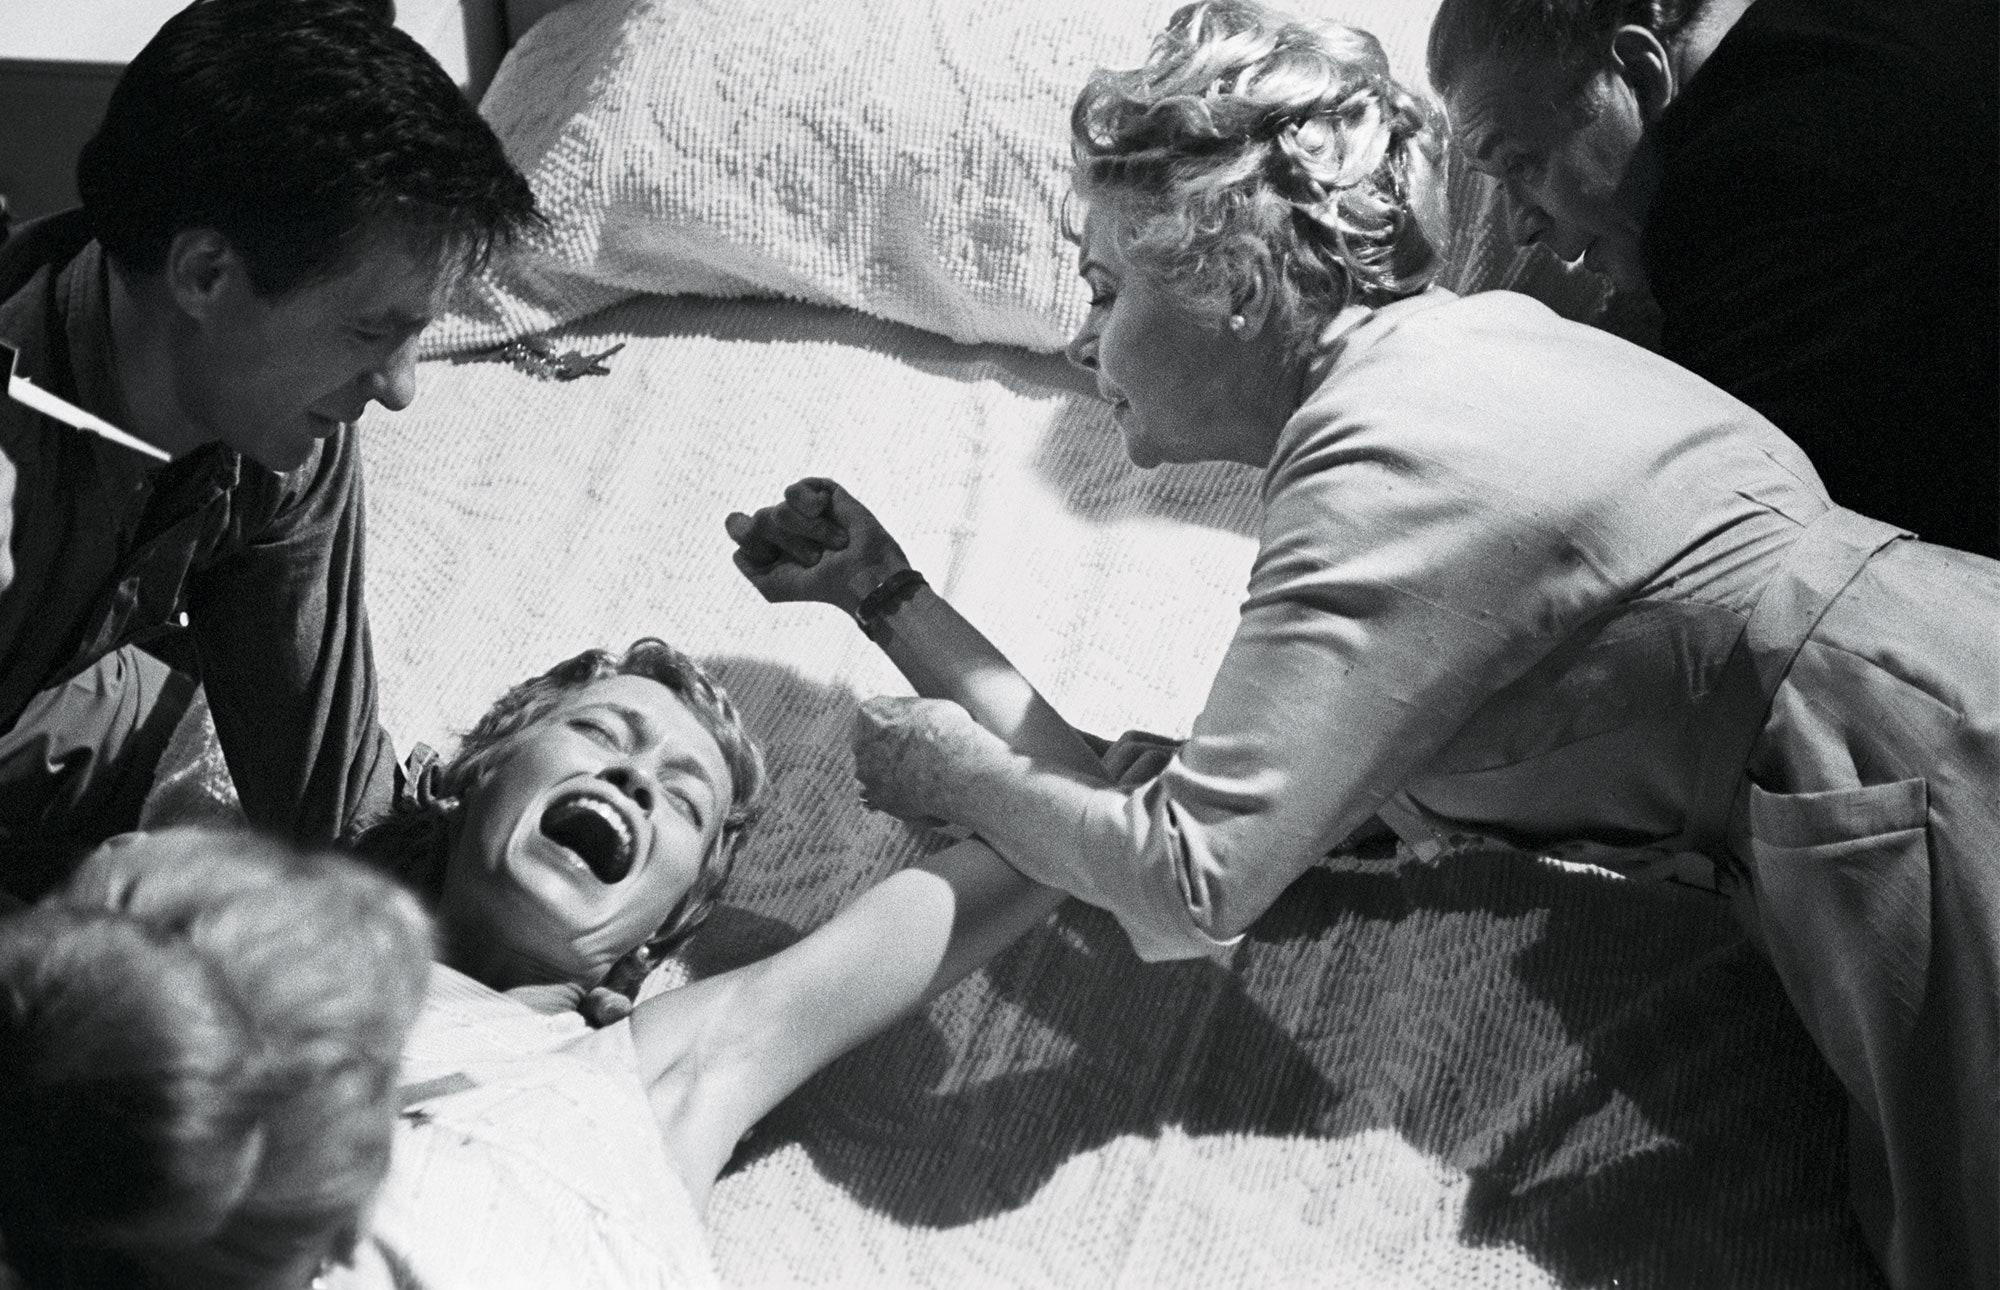 The Devil Inside: Watching Rosemary's Baby in the Age of #MeToo | Vanity Fair